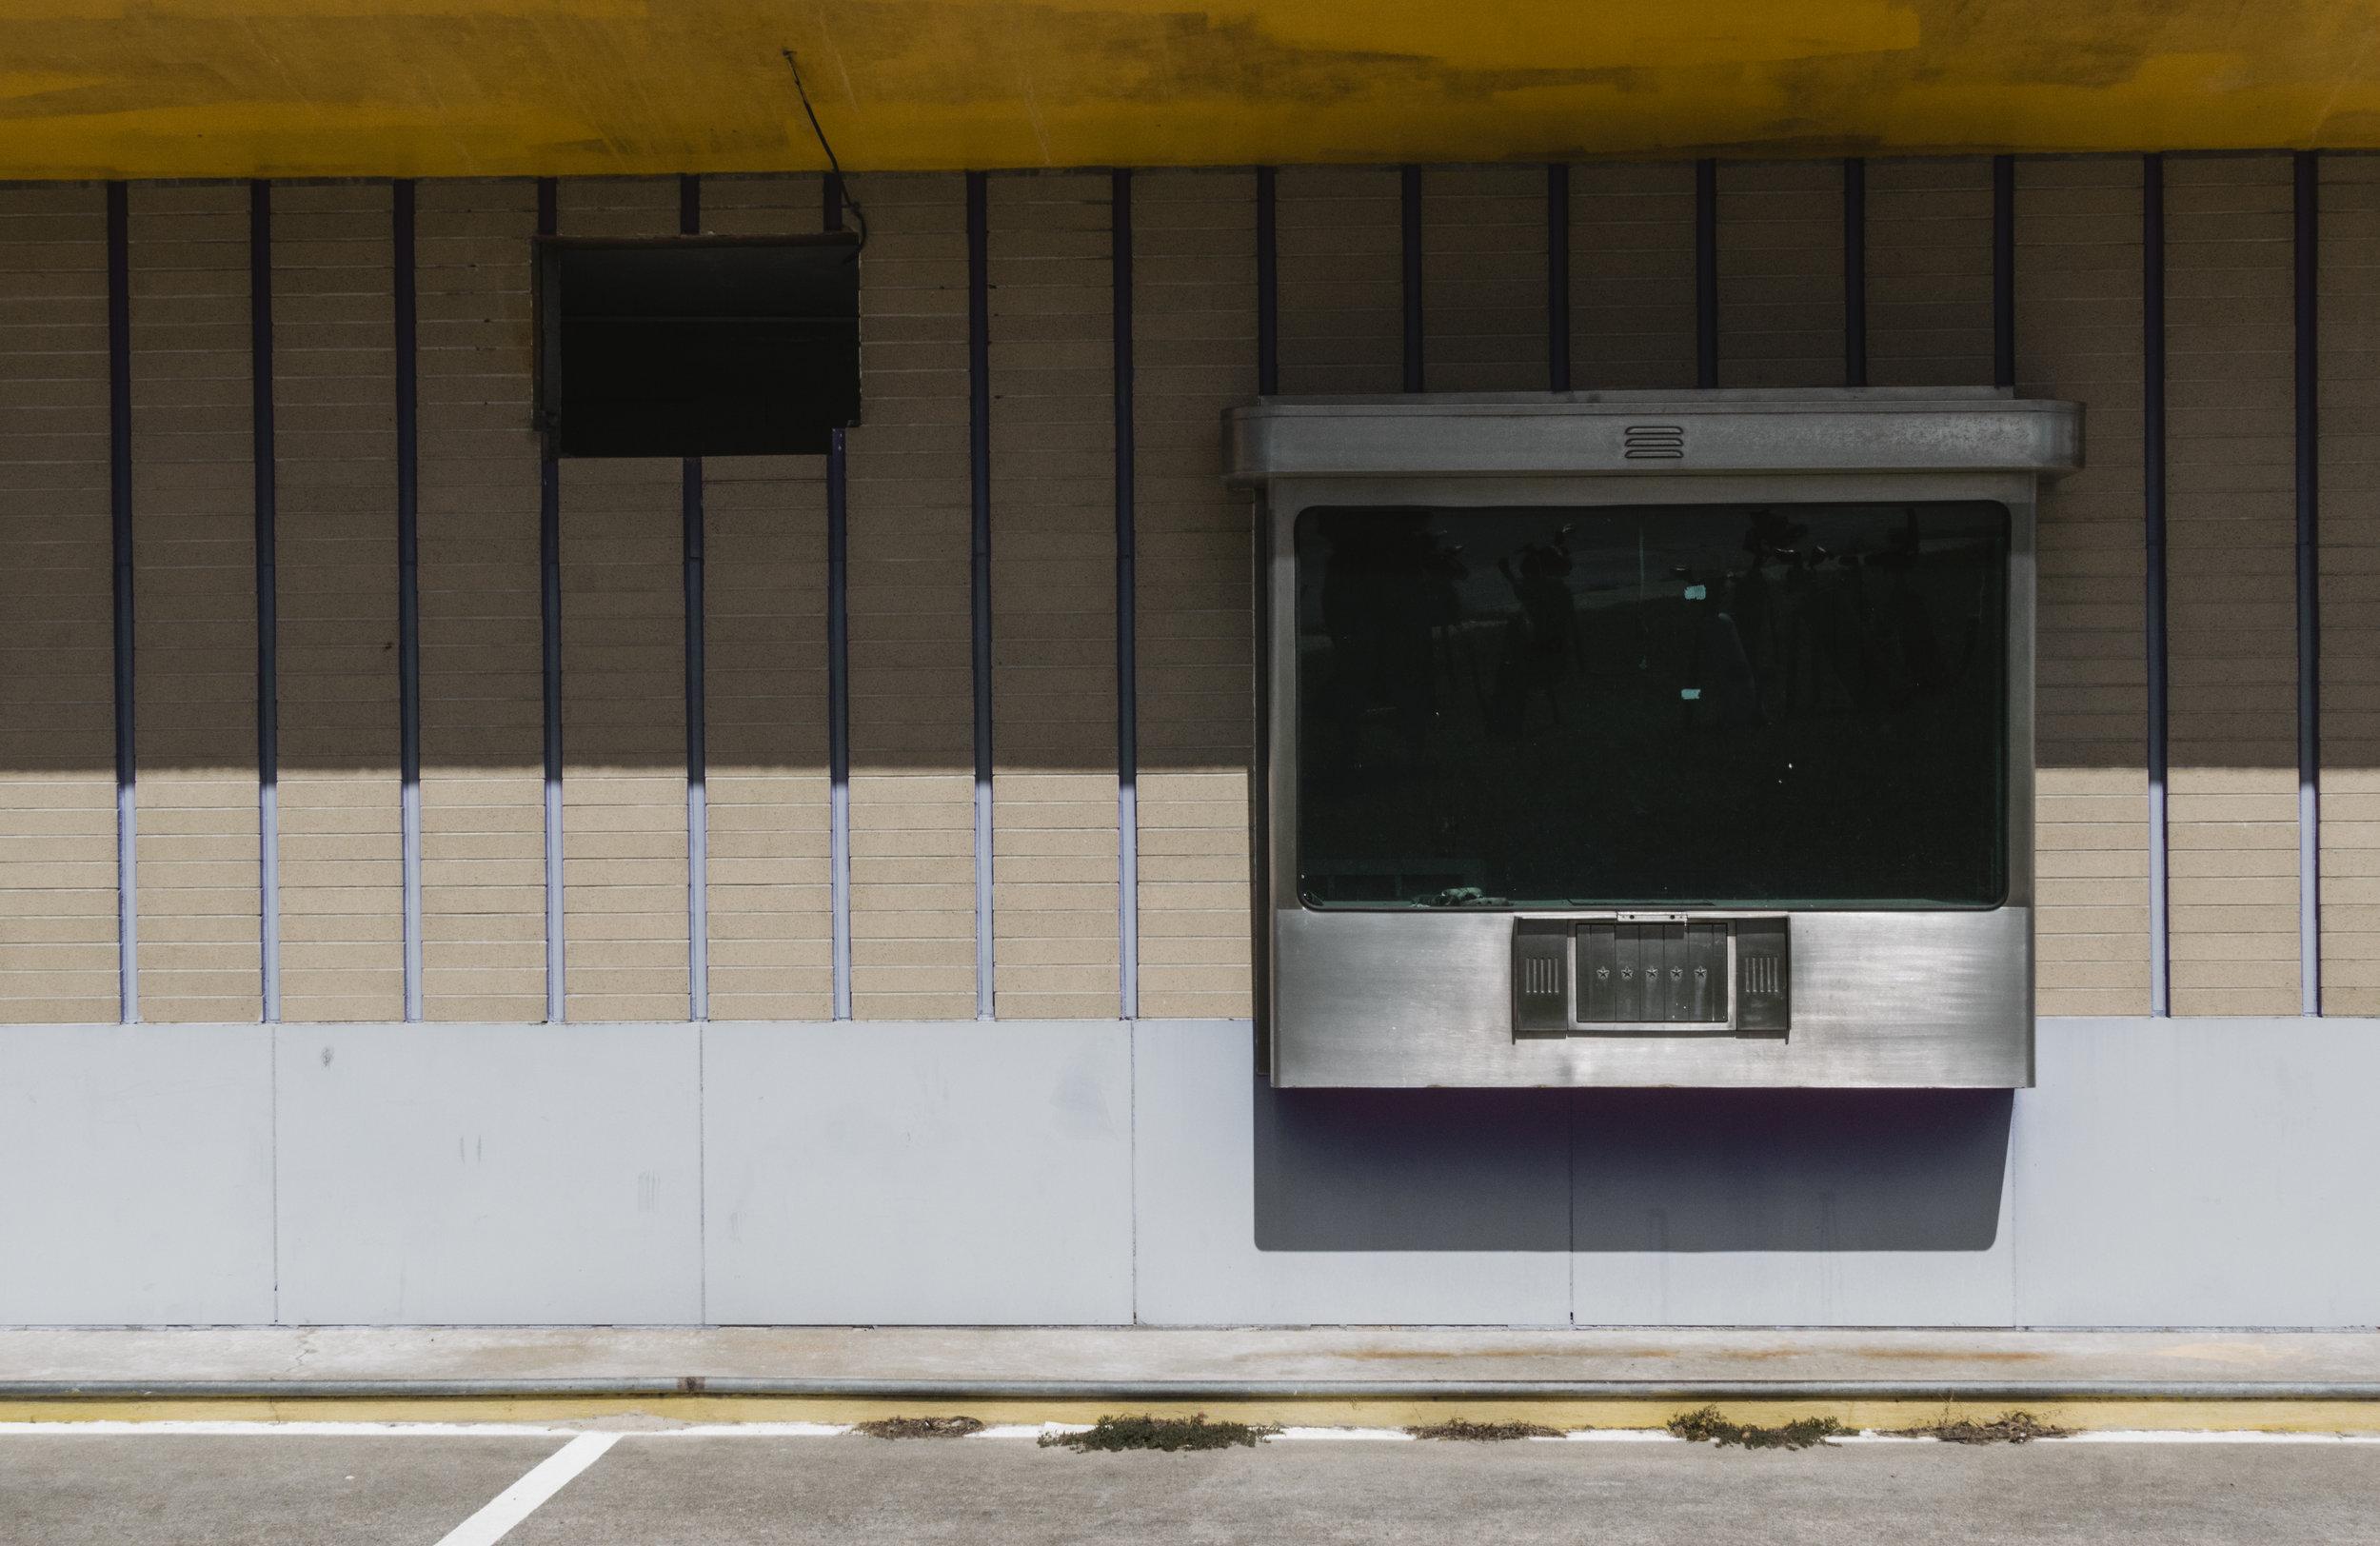 Streetscape-11.jpg